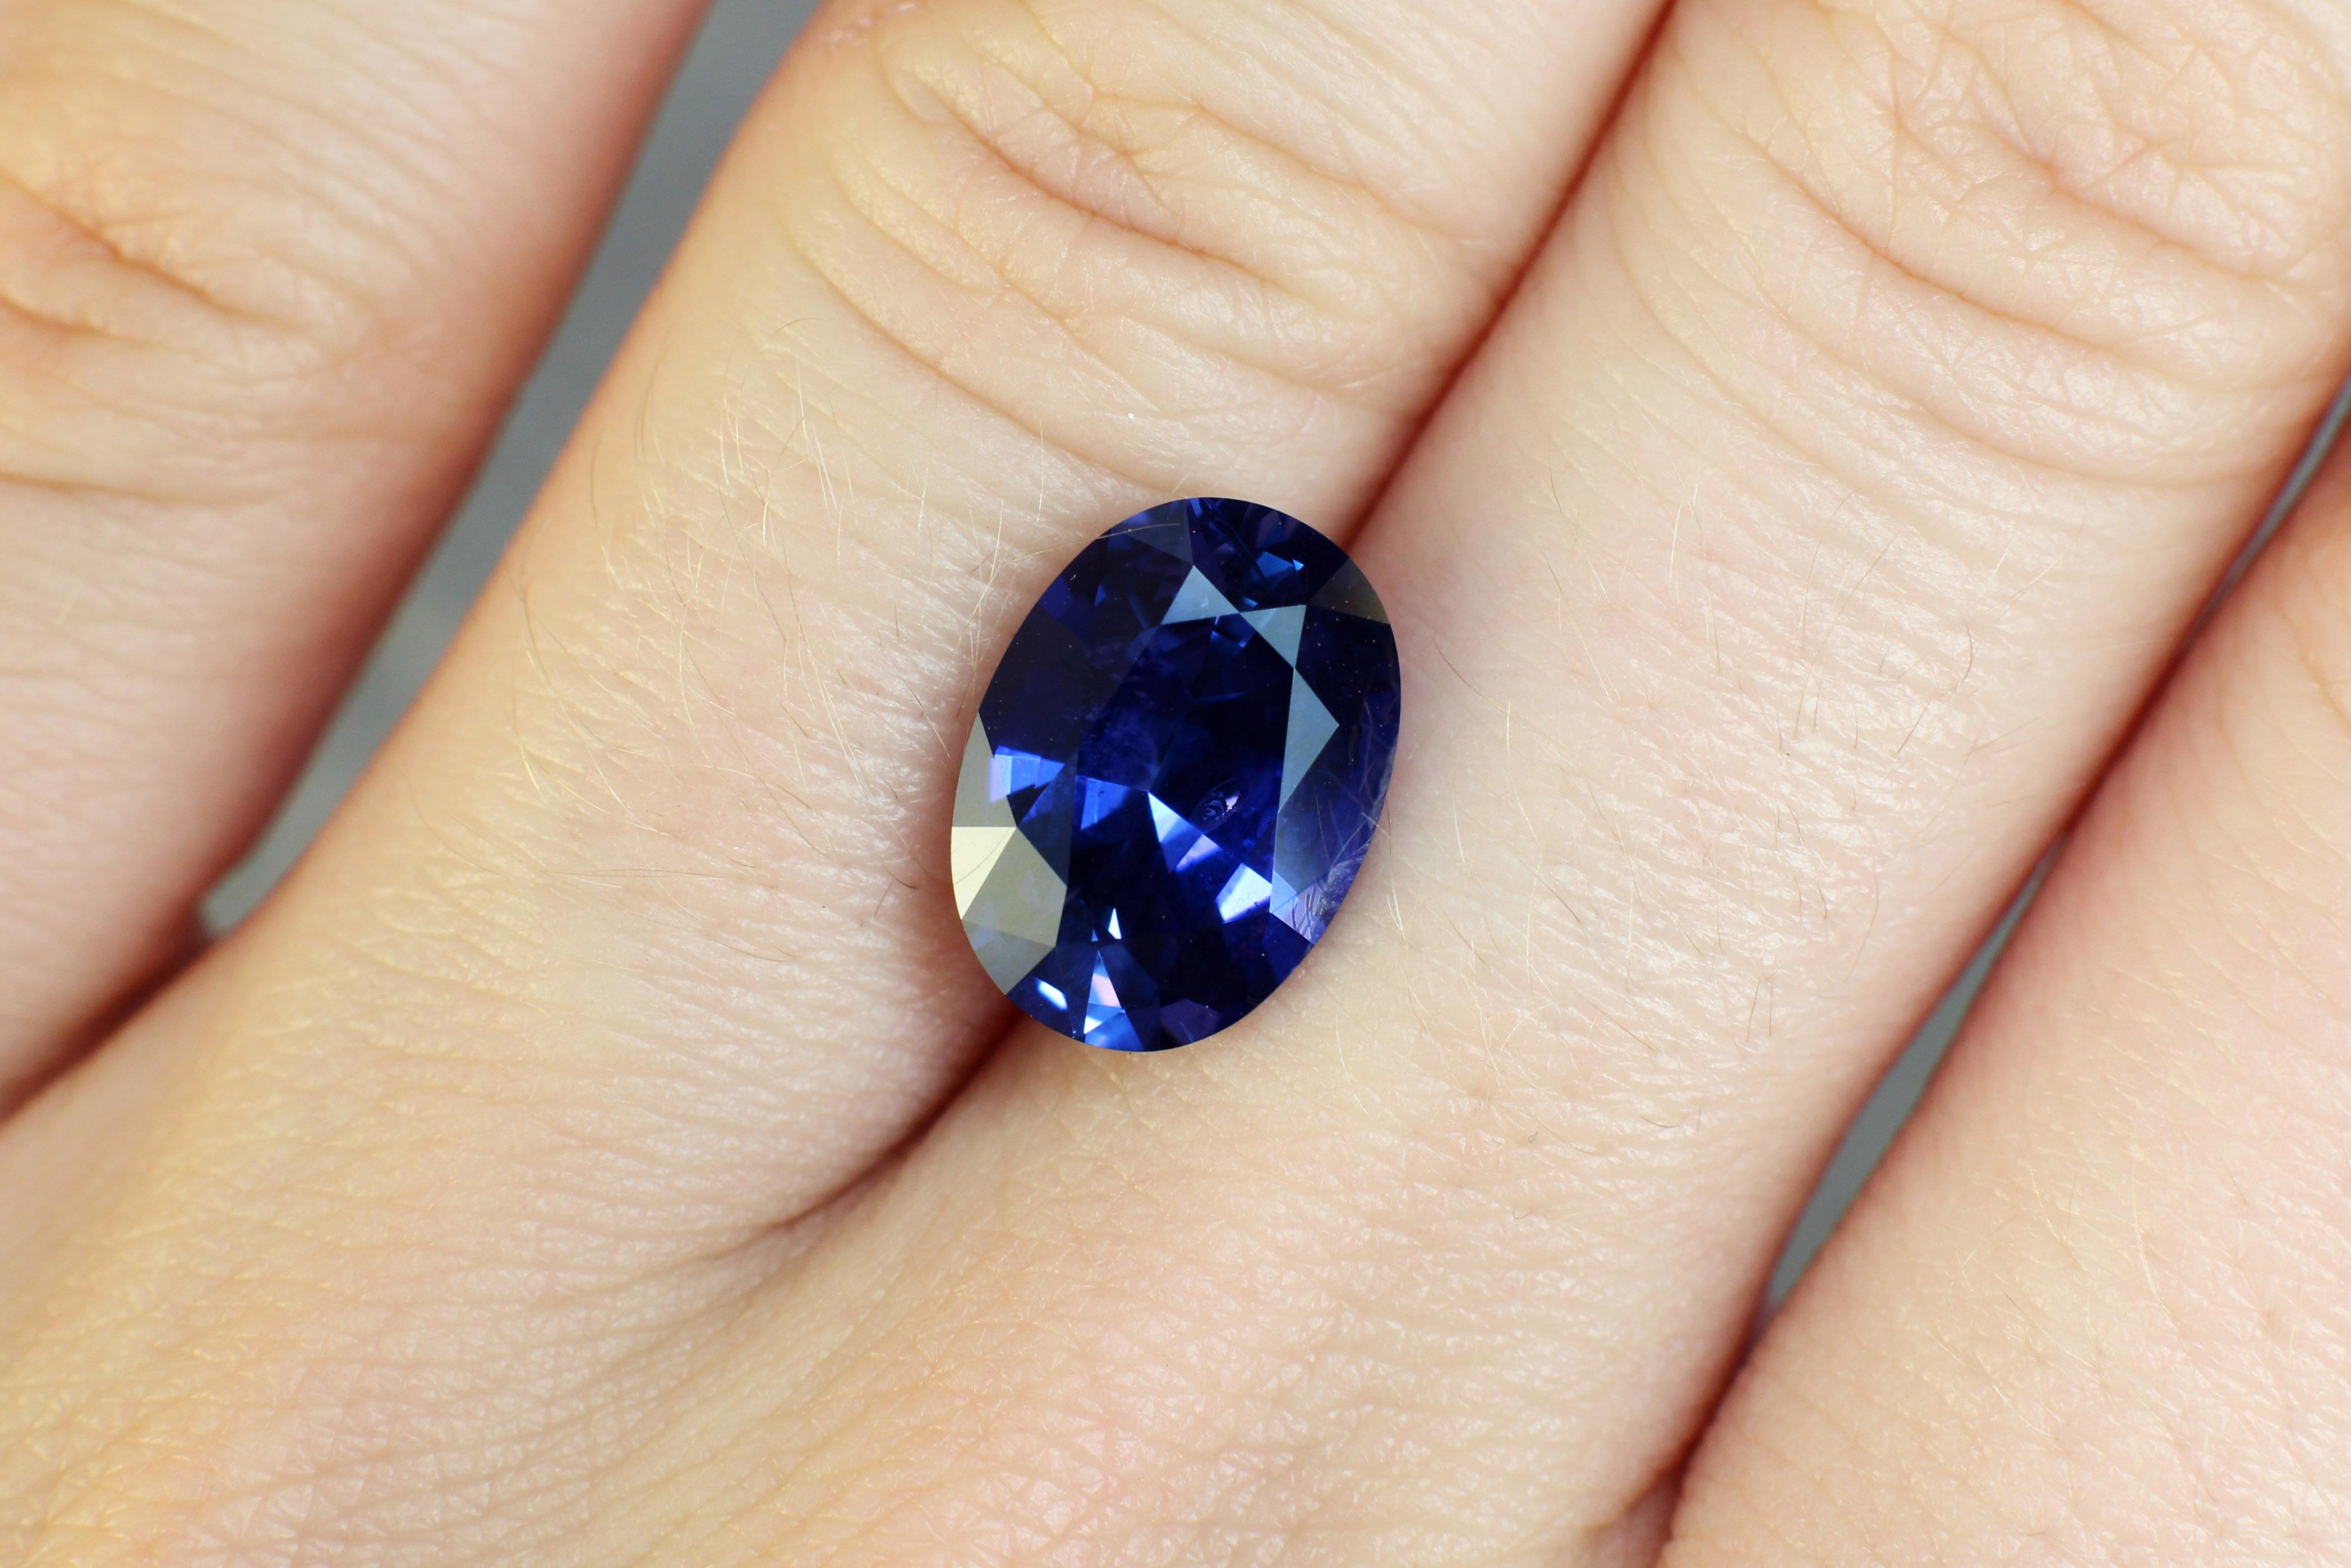 5.15 ct blue/violet oval sapphire